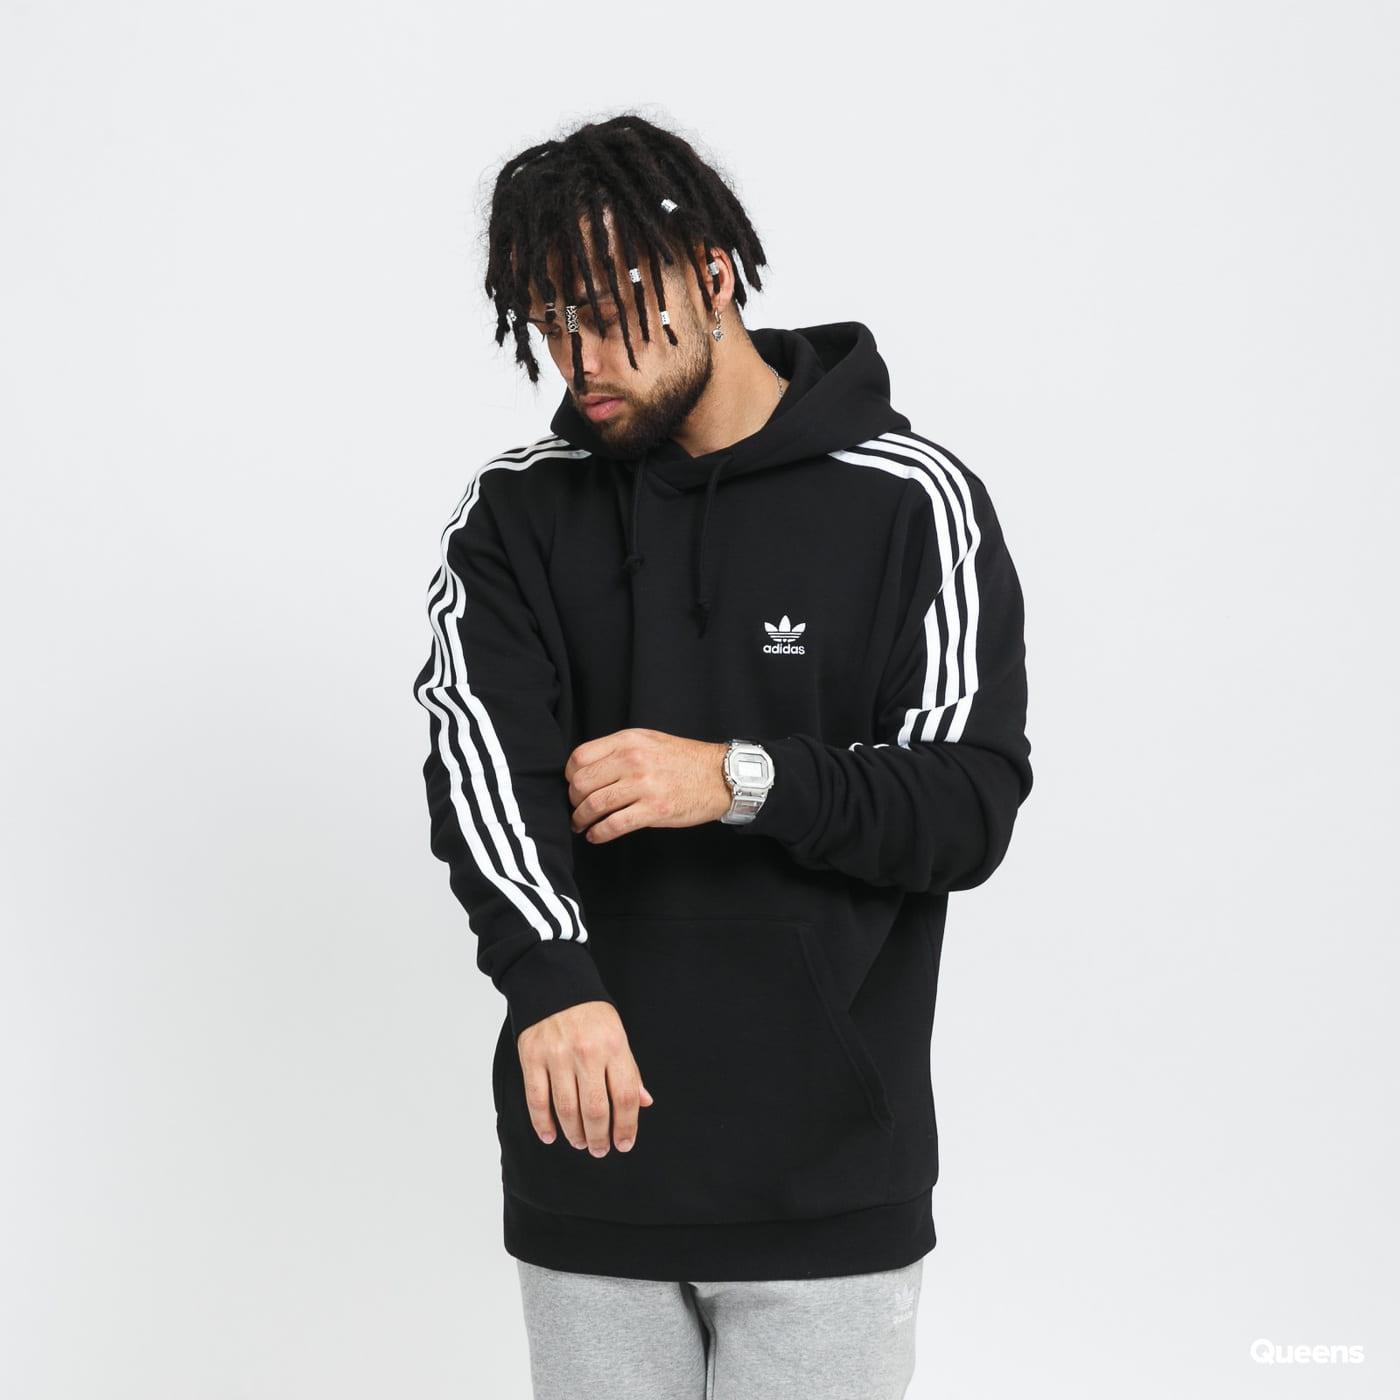 adidas Originals 3Stripe Hoody gray / beige / pink / black